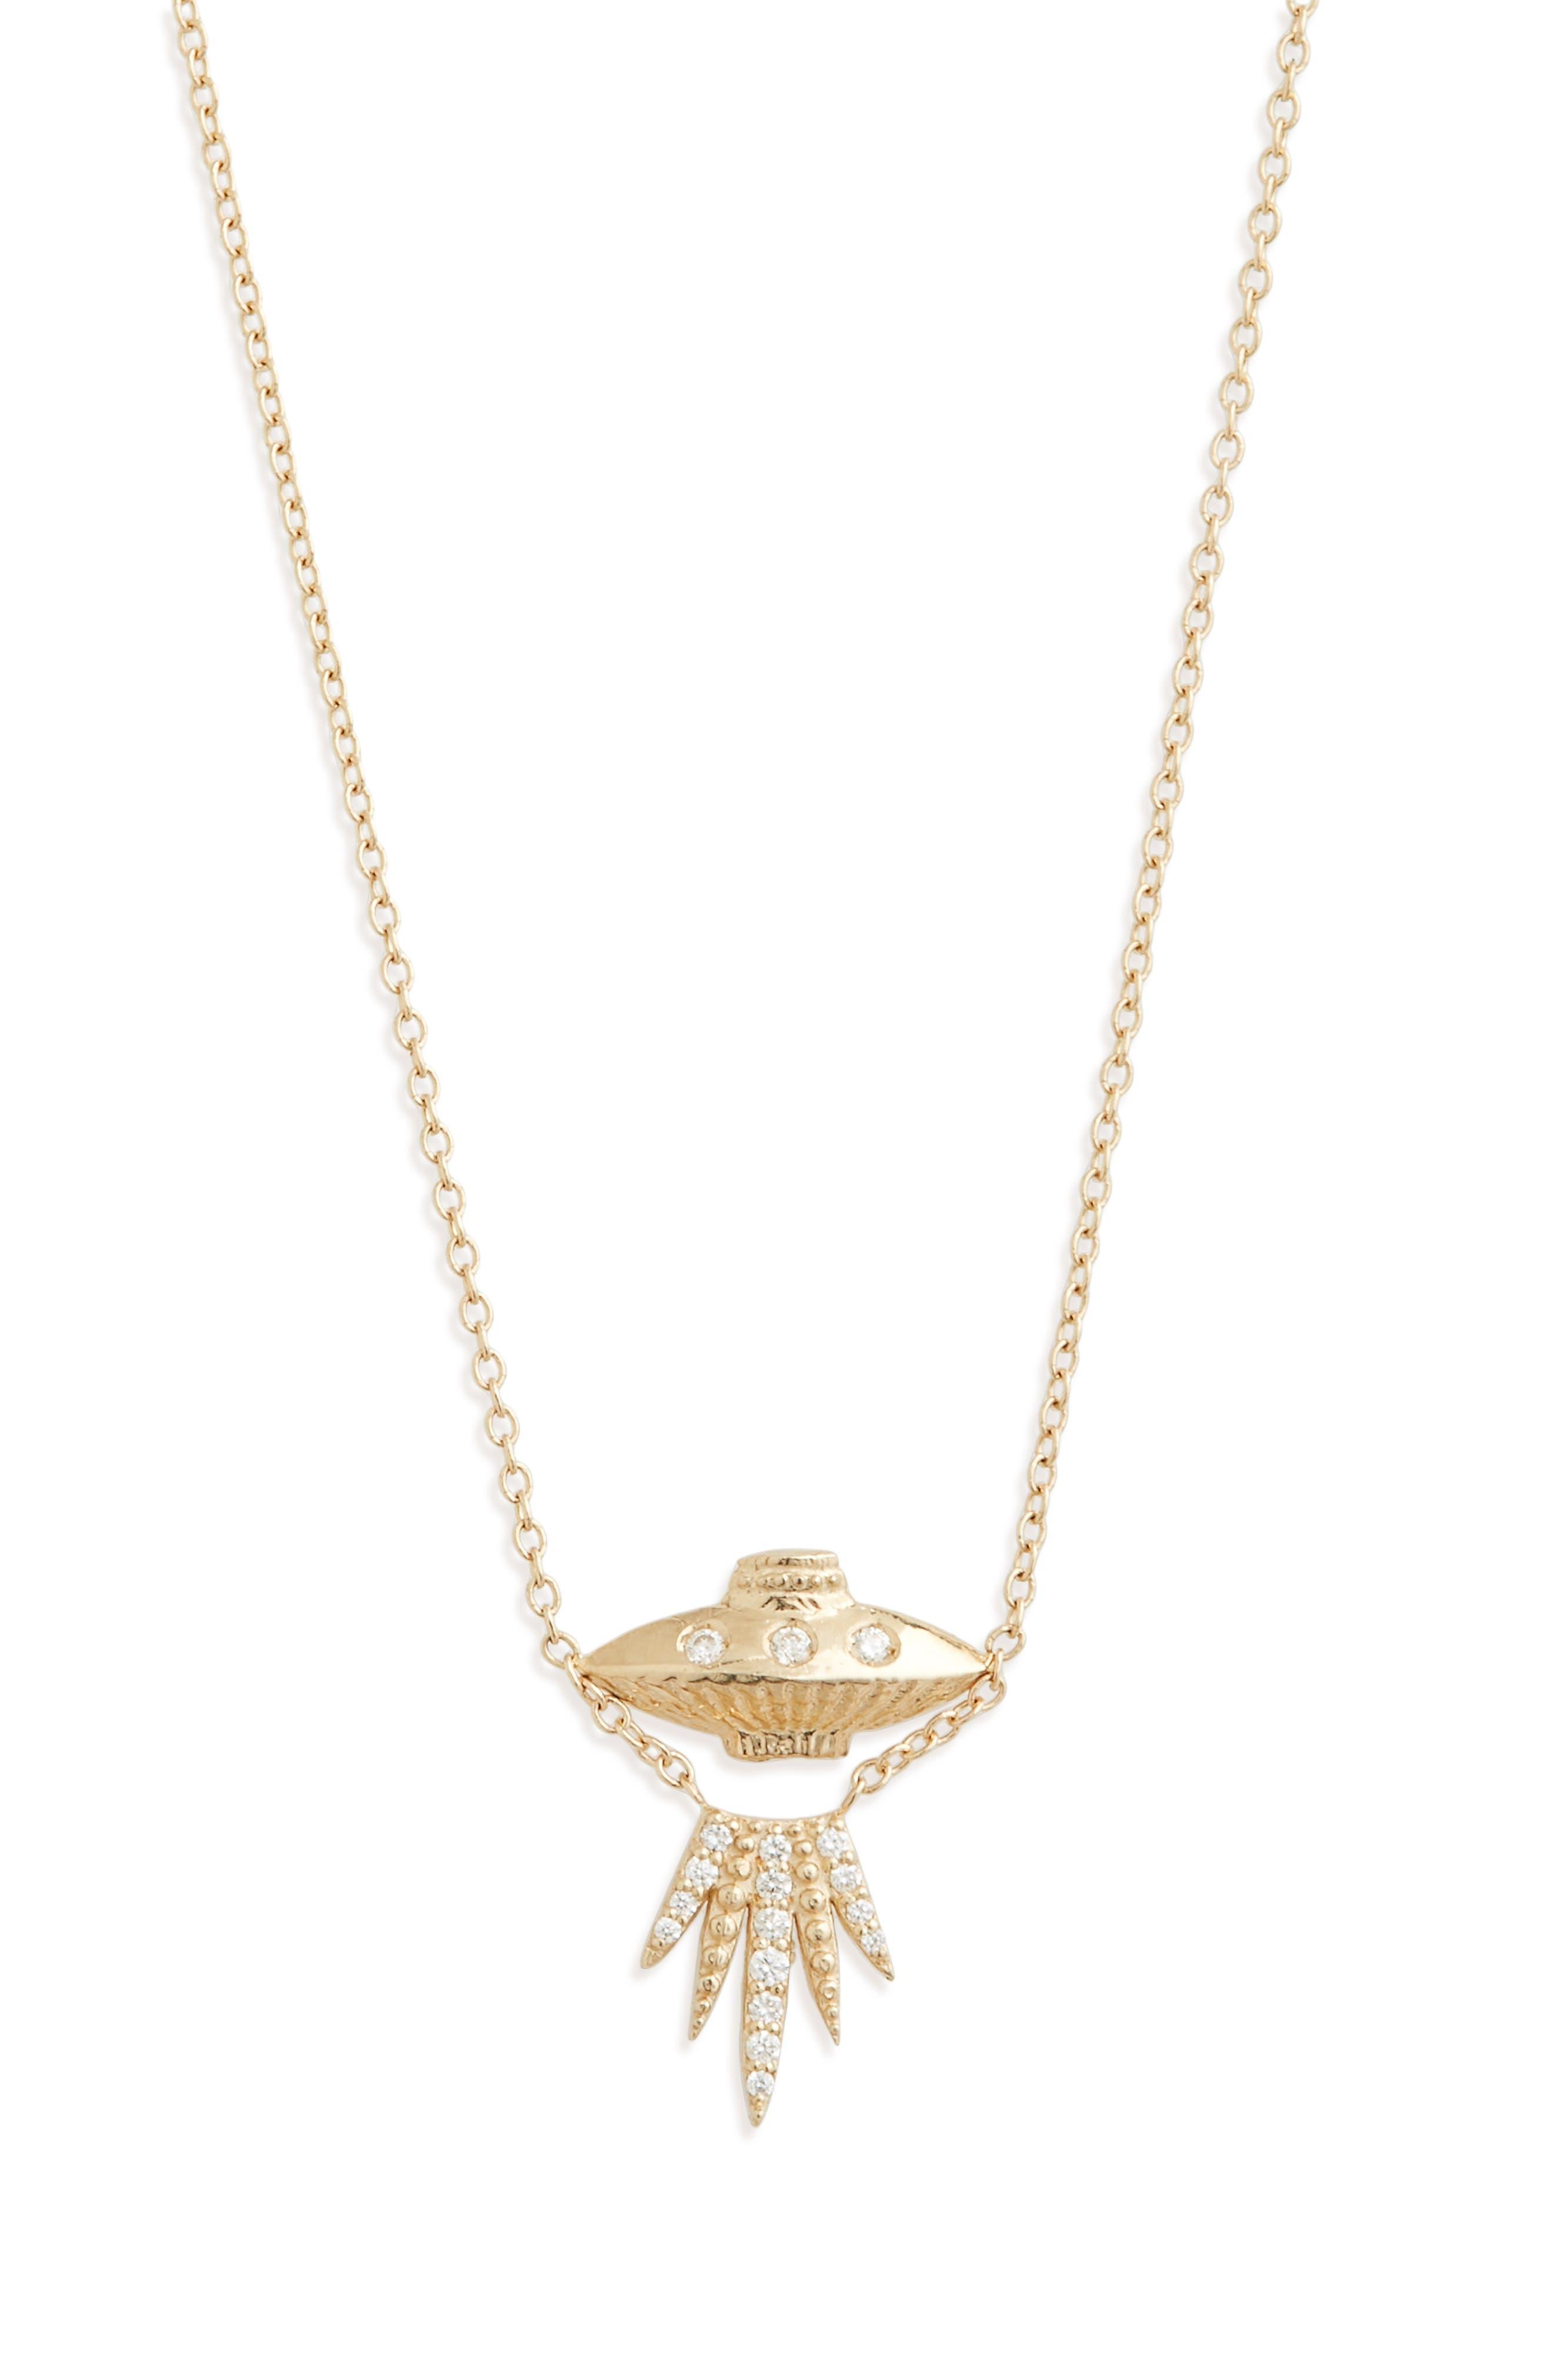 Tender Abduction UFO Diamond Necklace,                             Main thumbnail 1, color,                             GOLD